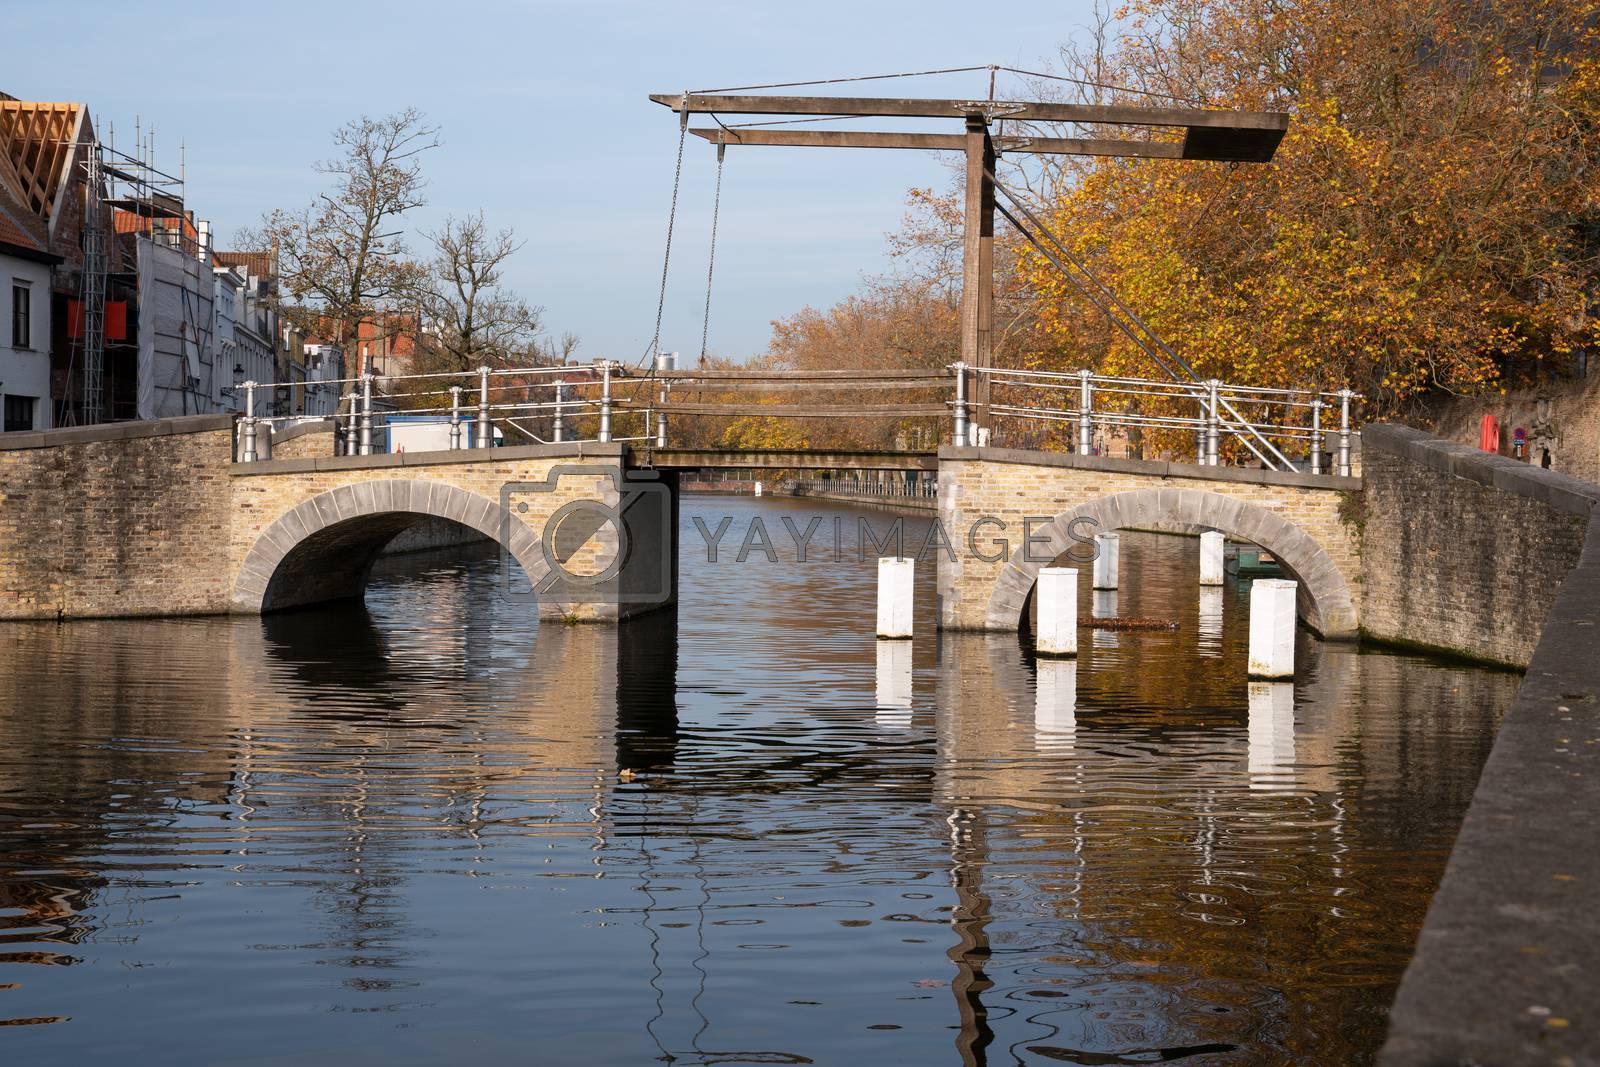 Old bridge crossing the canals of Bruges, Belgium